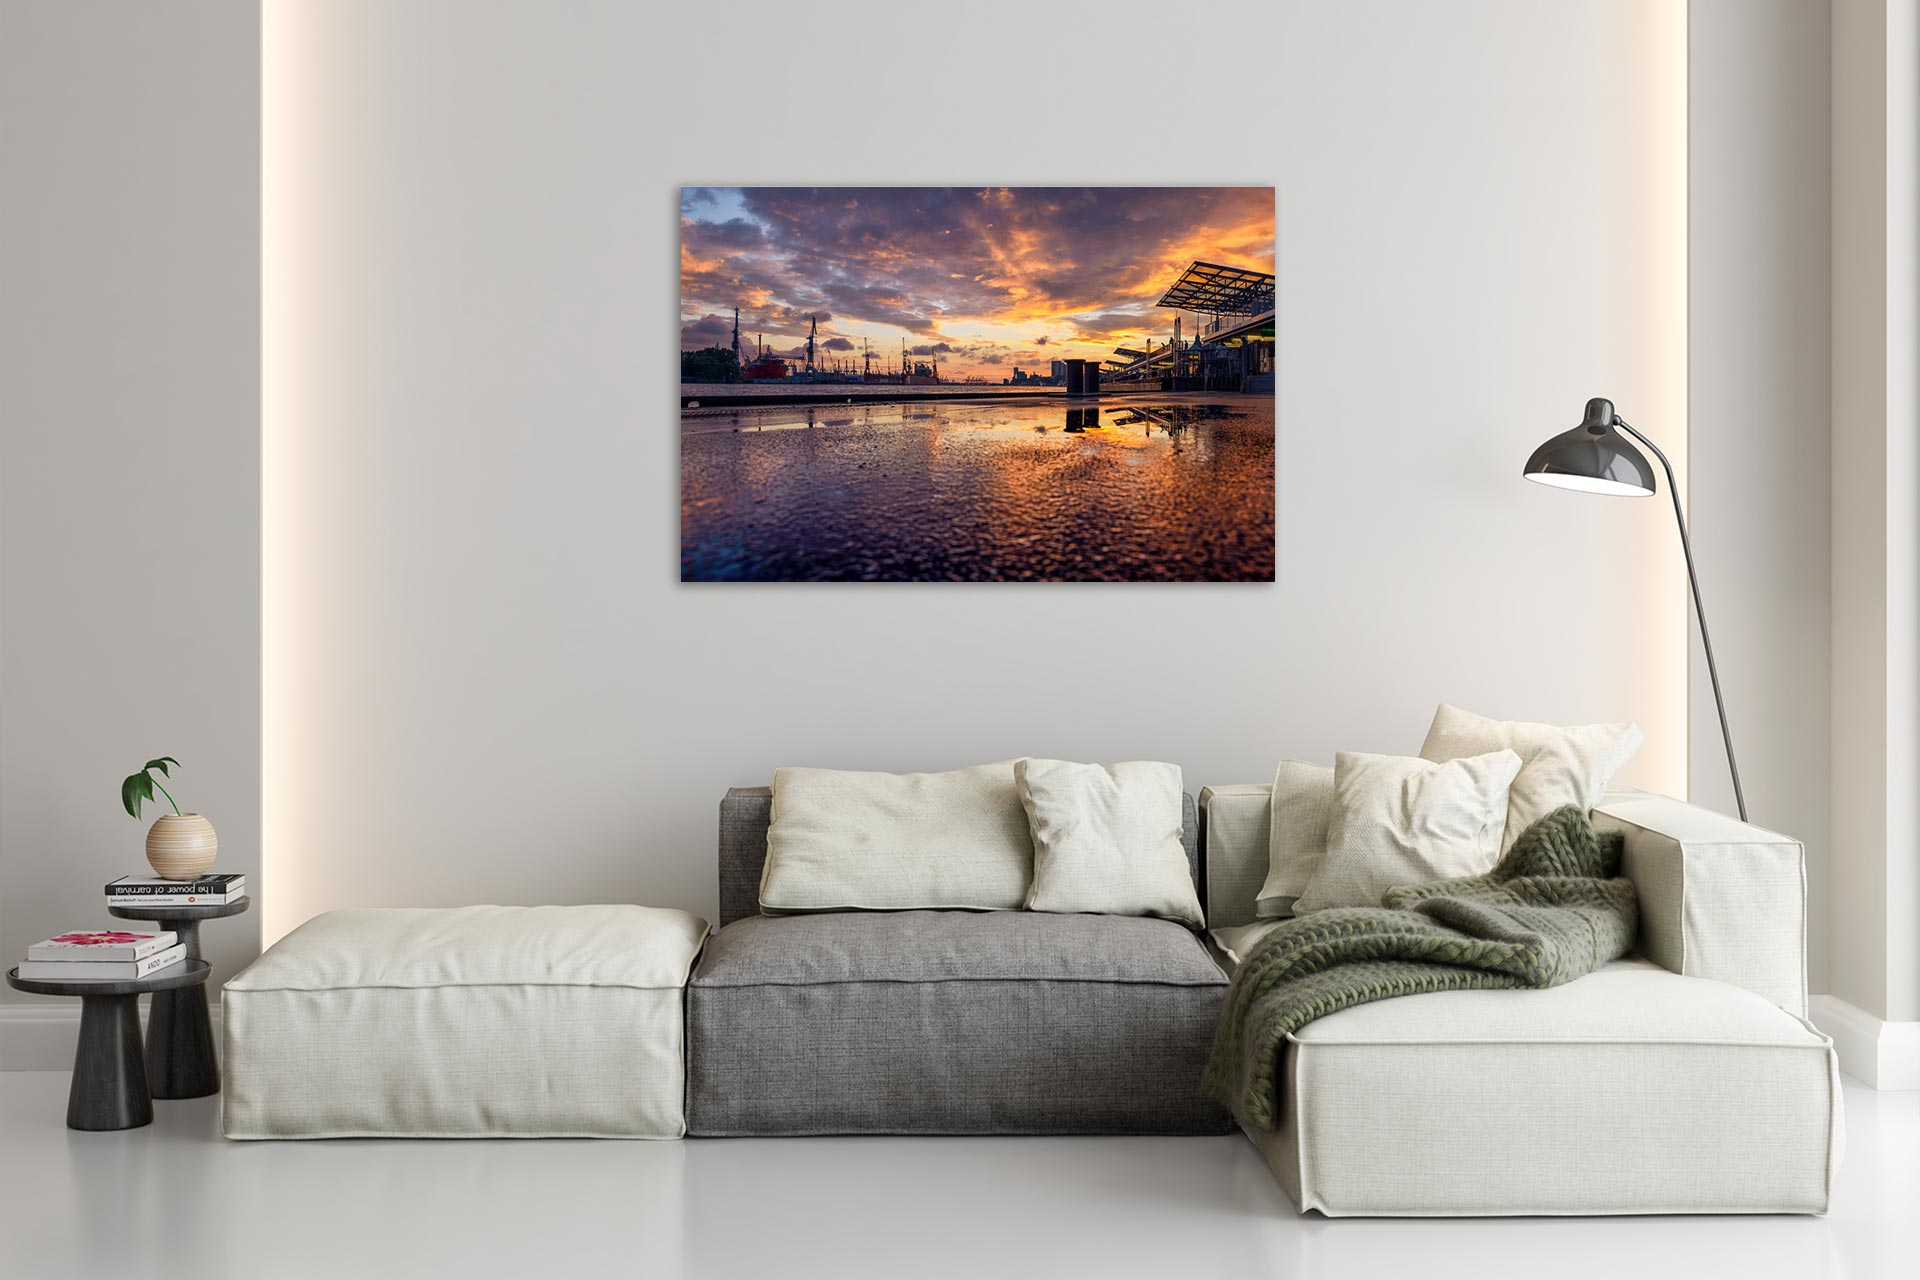 TG615-landungsbruecken-on-fire-wandbild-bild-auf-leinwand-acrylglas-aludibond-wohnzimmer